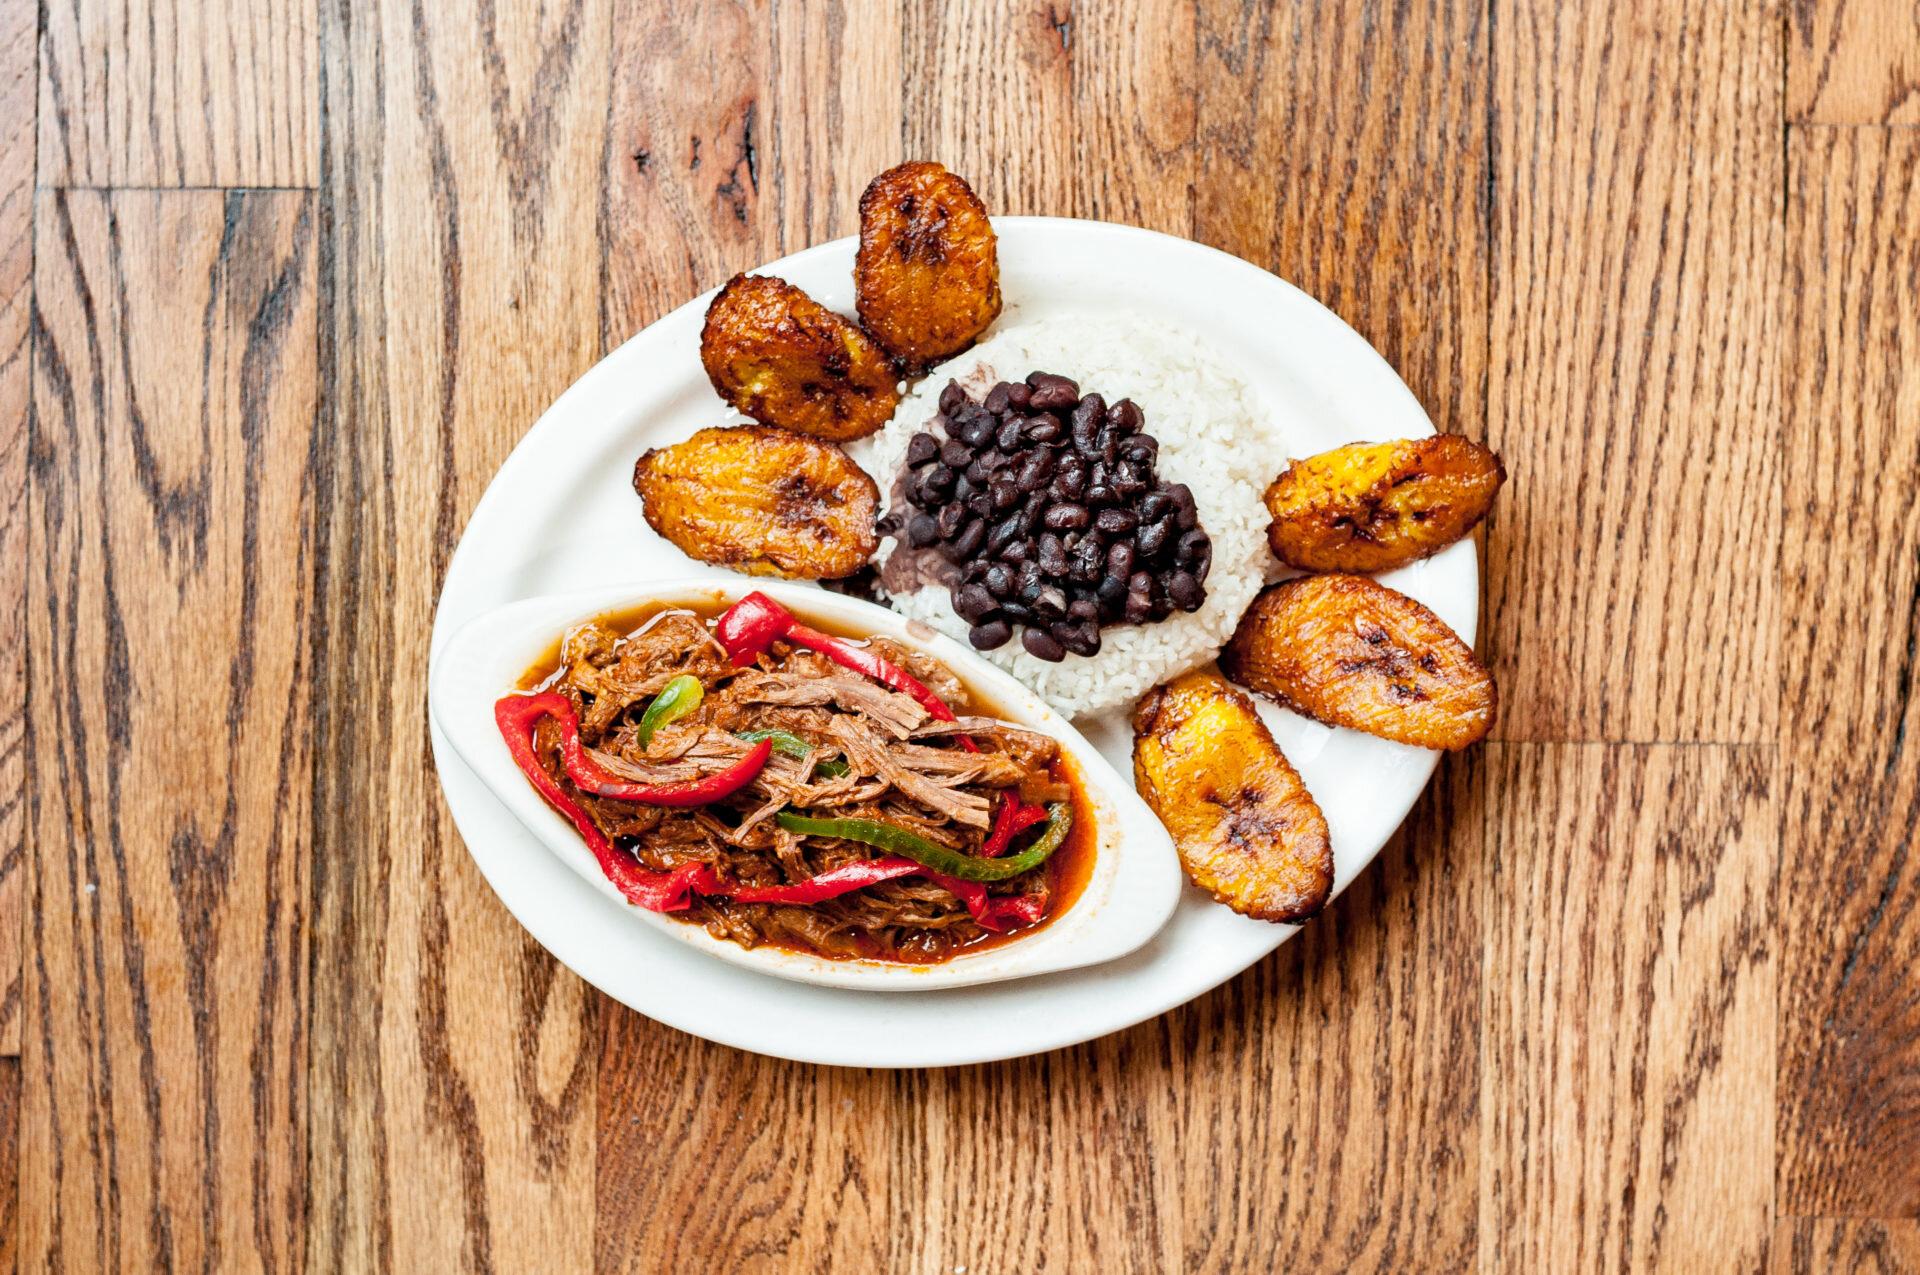 1492 Cuban Fusion Café - $, Cuban, BYOB